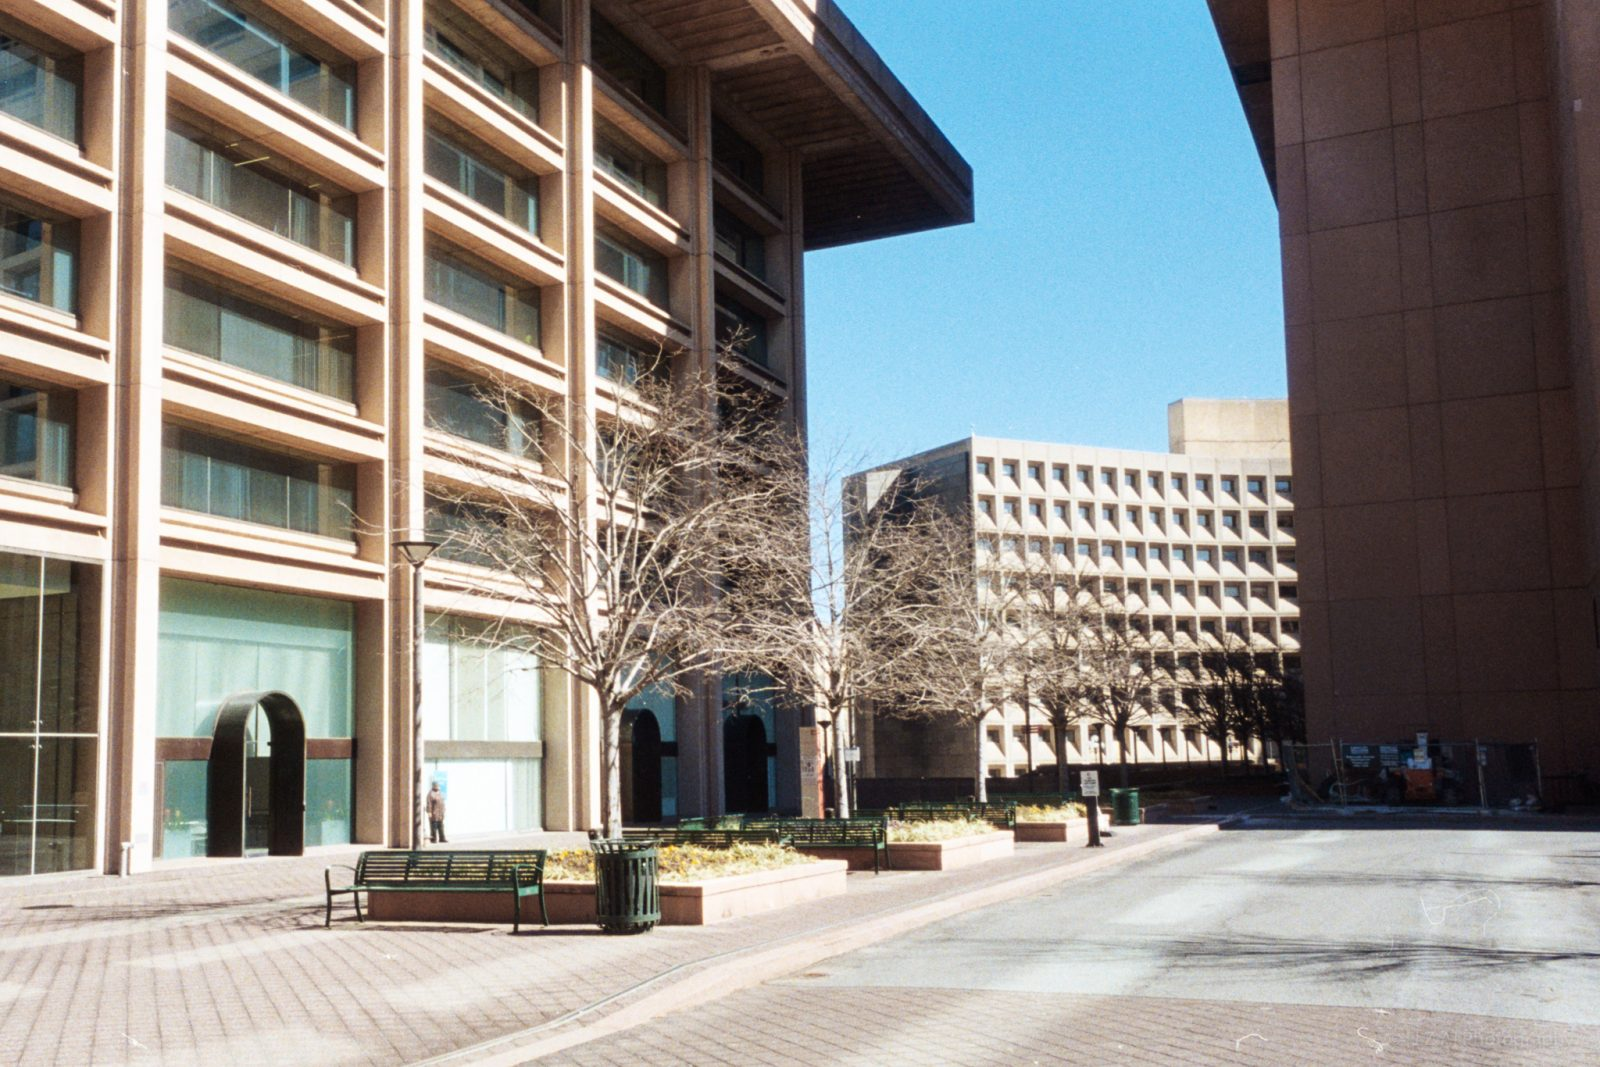 Department of Housing and Urban Development, Robert C. Weaver Federal Building